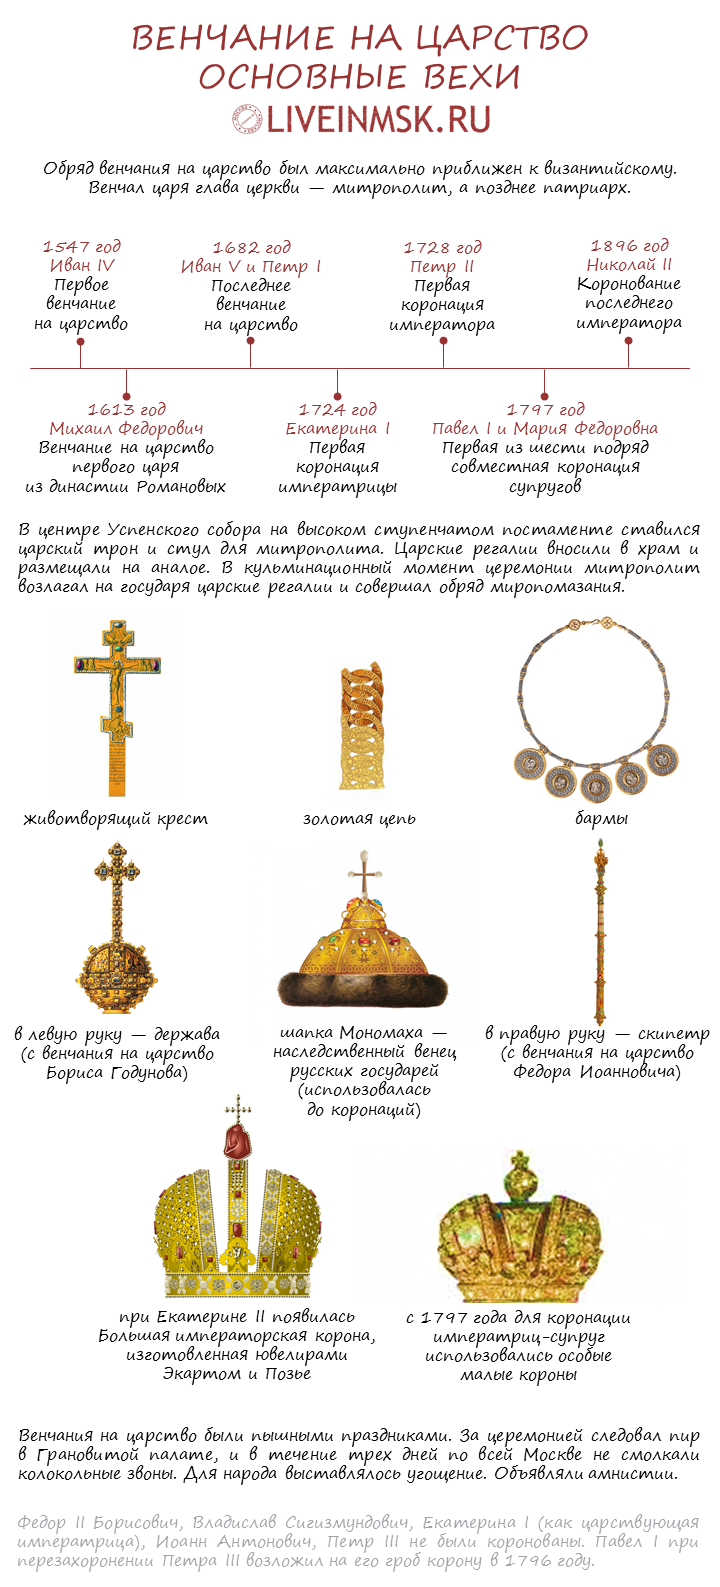 Венчание на царство и церемония коронации в Успенском соборе